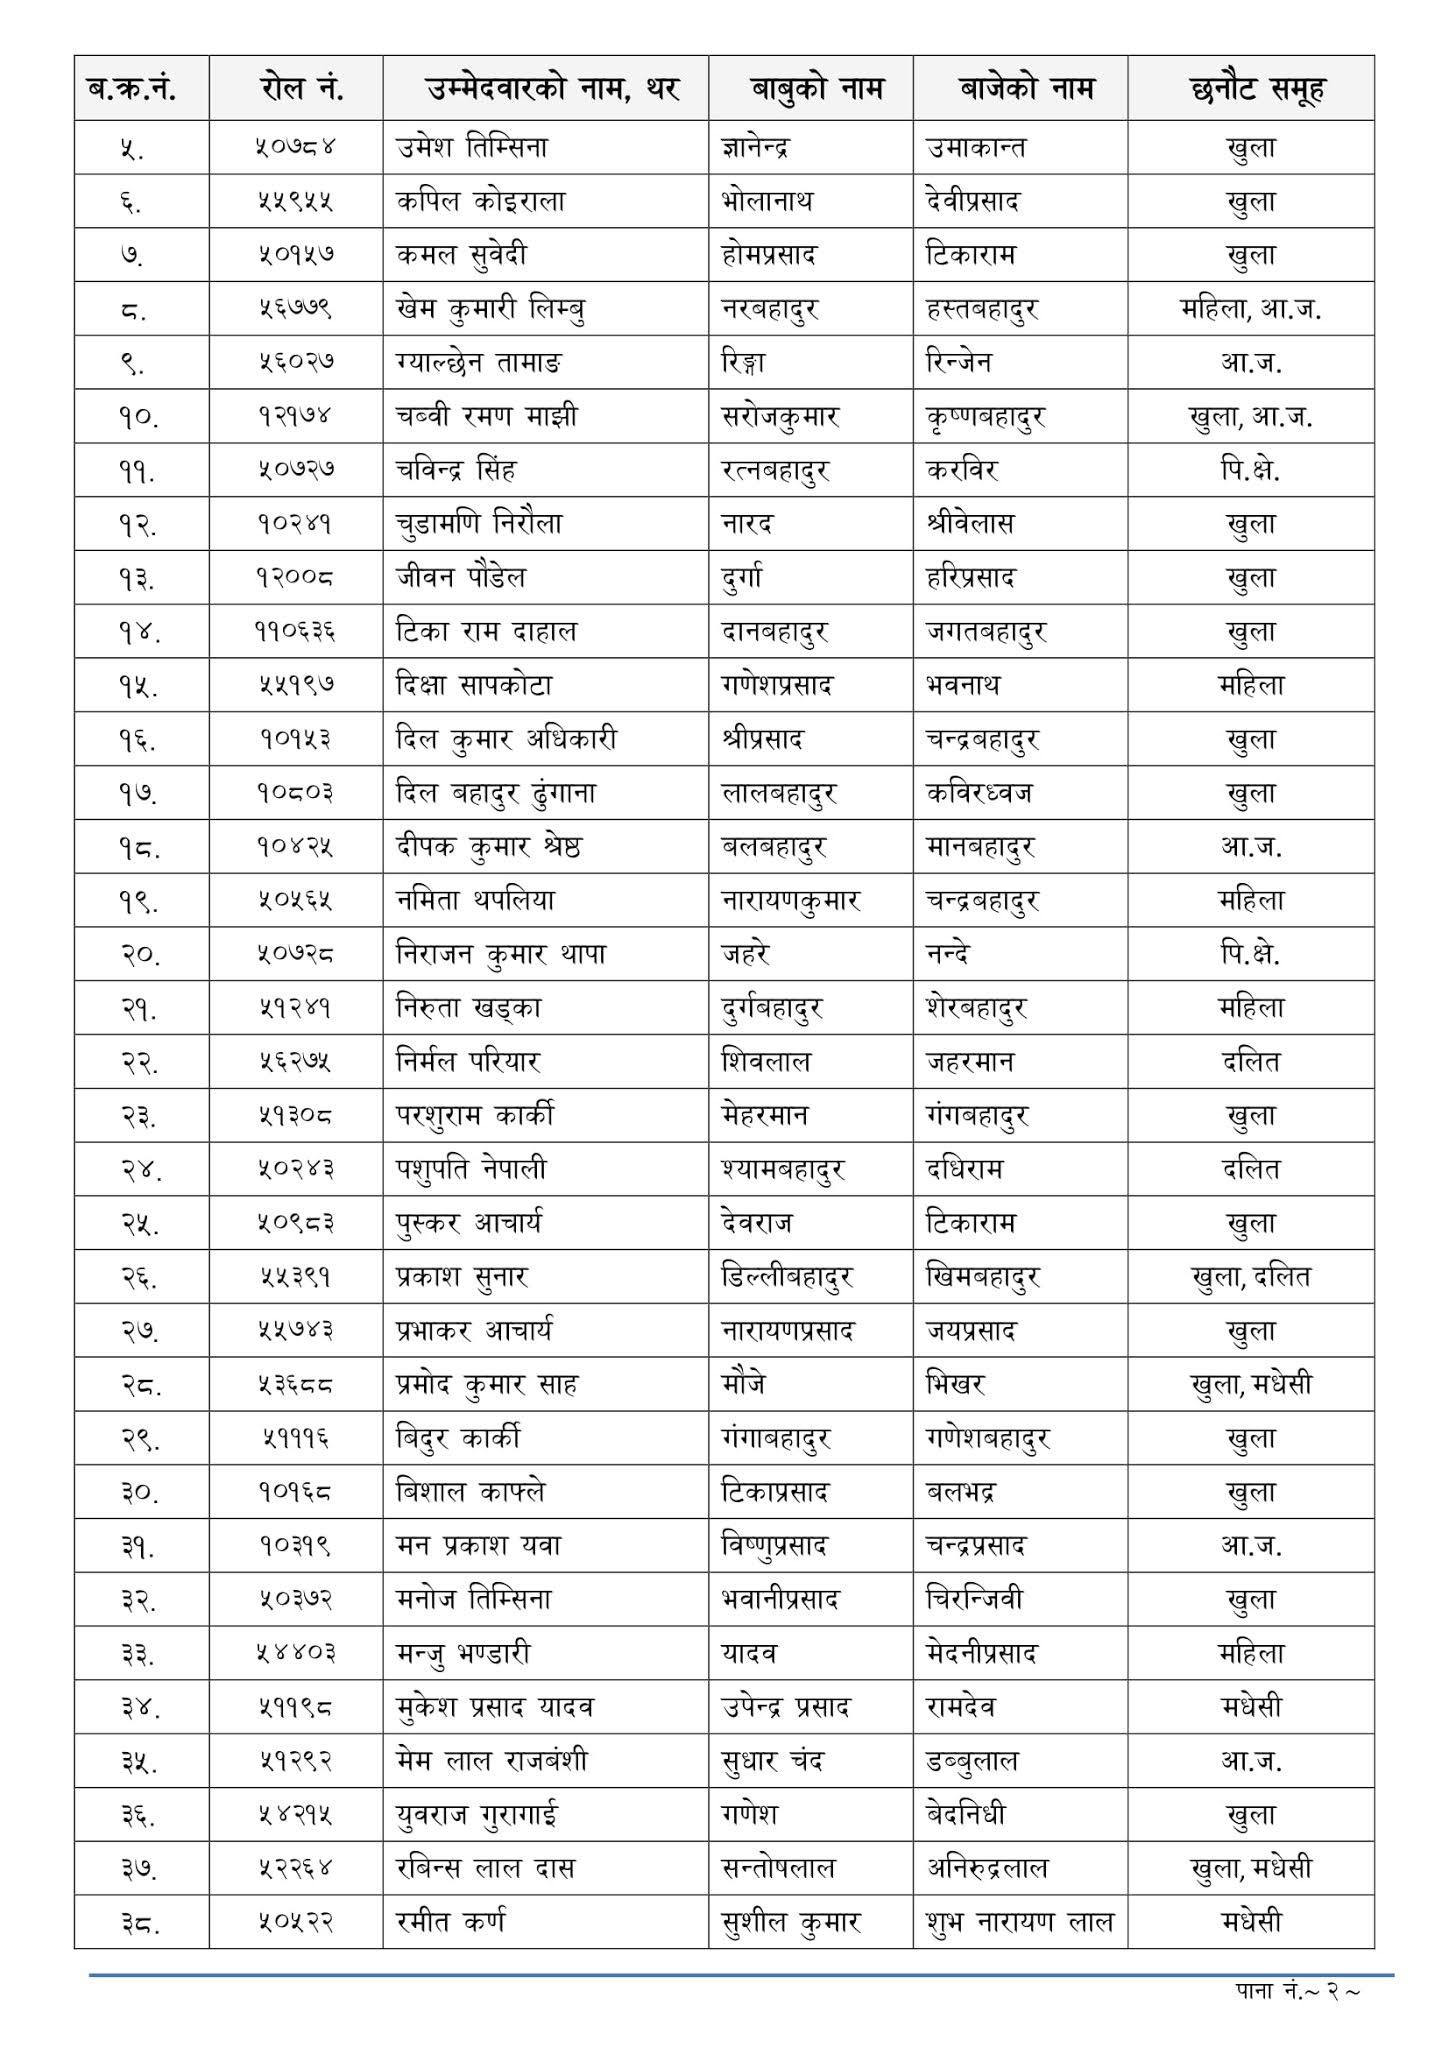 NASU Revenue (Rajashwo) - Dhankuta Lok Sewa Aayog Written Exam Result & Exam Schedule